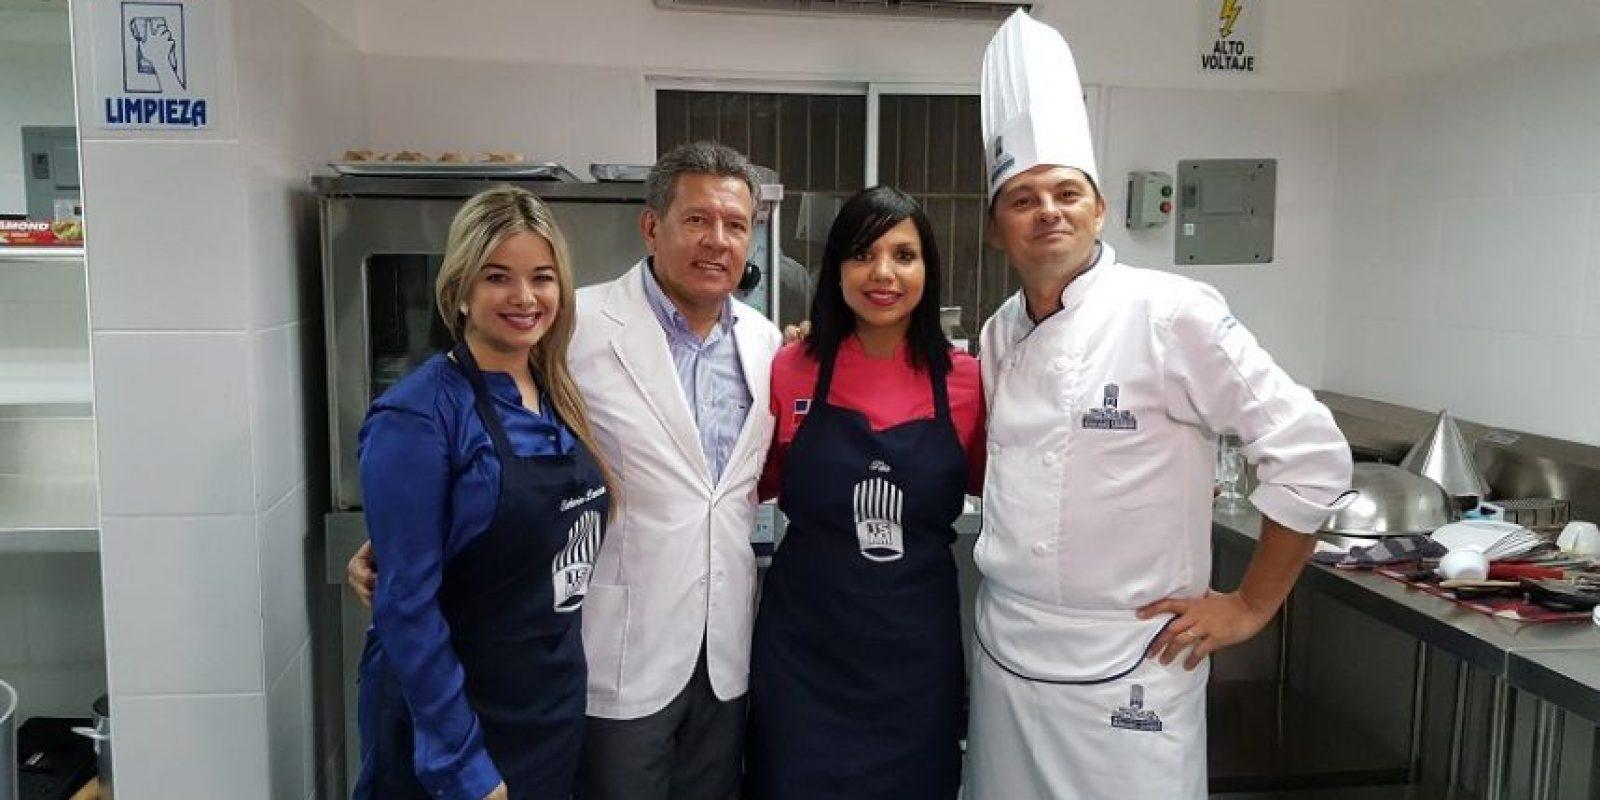 Catherine Lemoine, Adolfo Artiles, Inés Paez (chef Tita) y el chef Gilles Brune. Foto:Fuente Externa